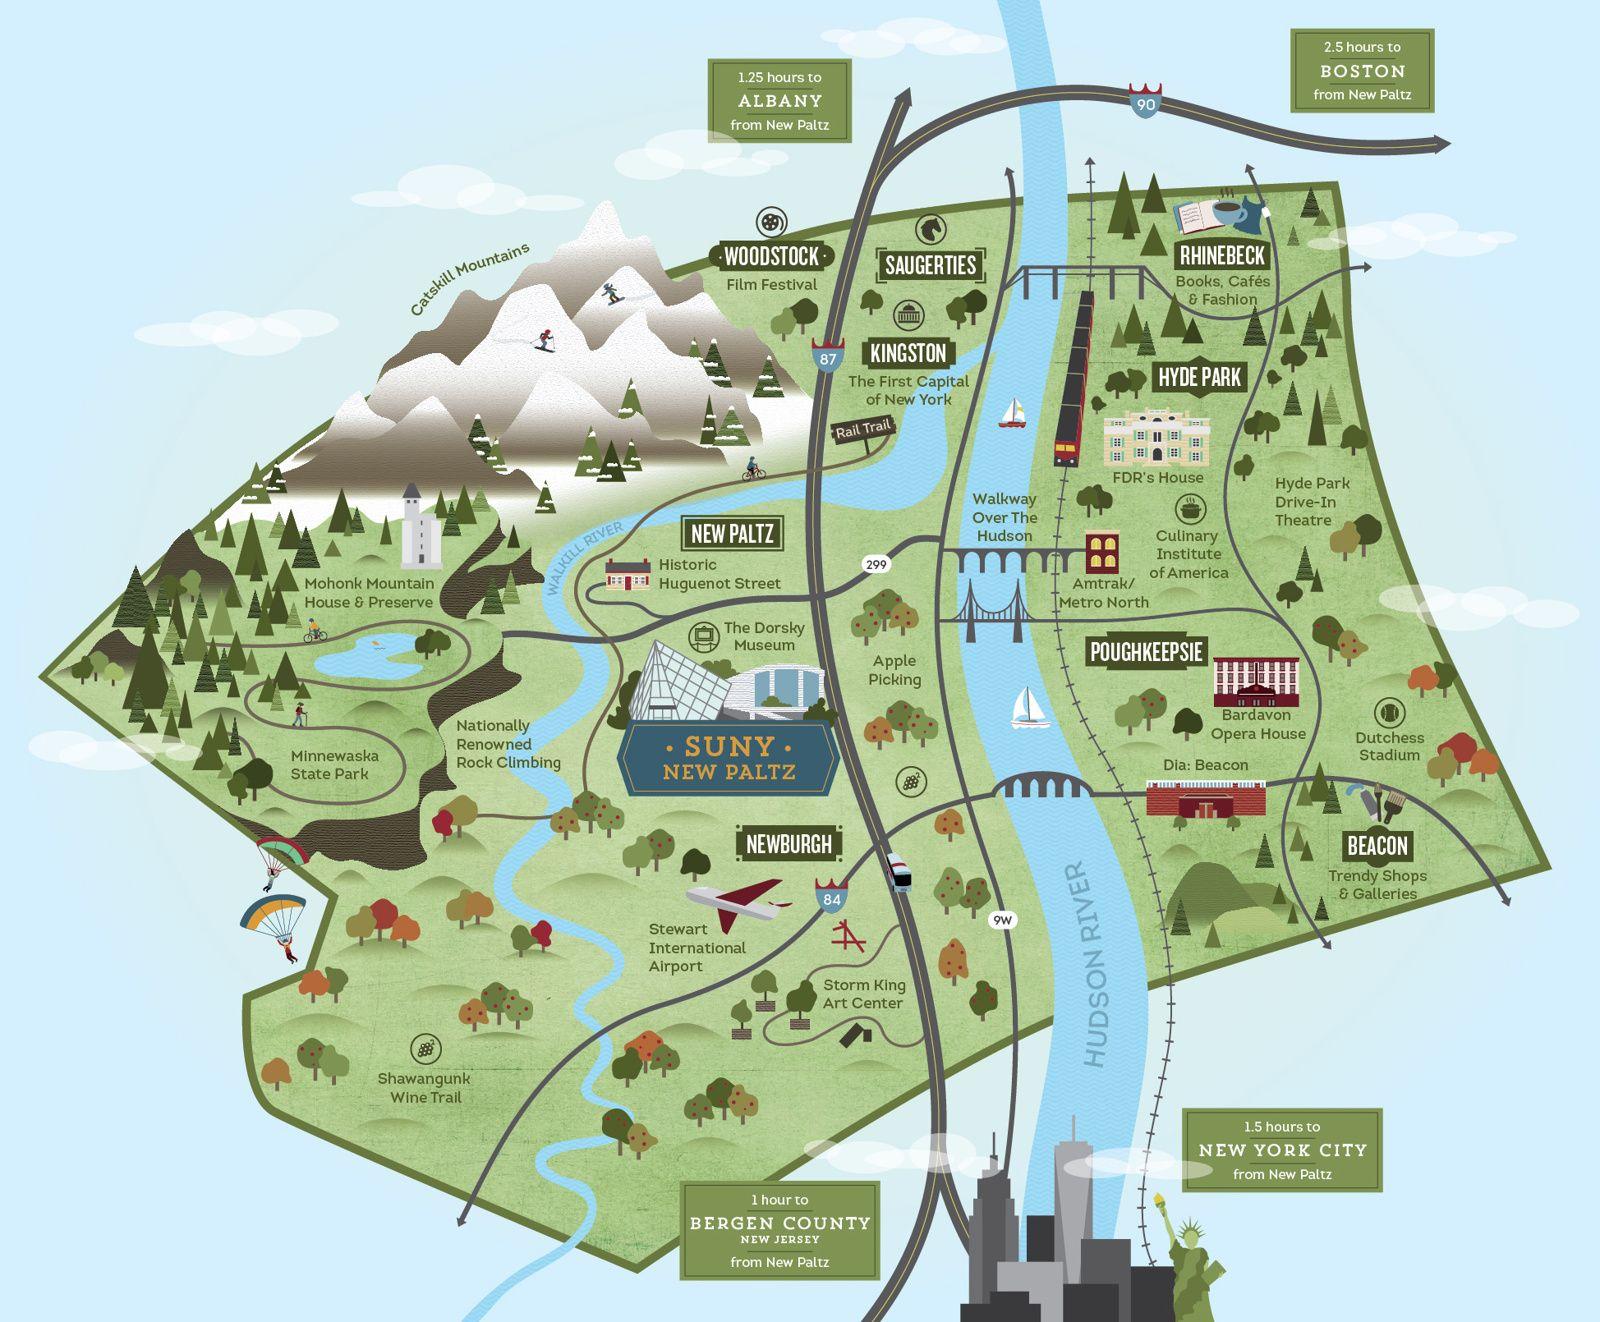 SUNY New Paltz Illustrated Tourism Map Cinder Design Co